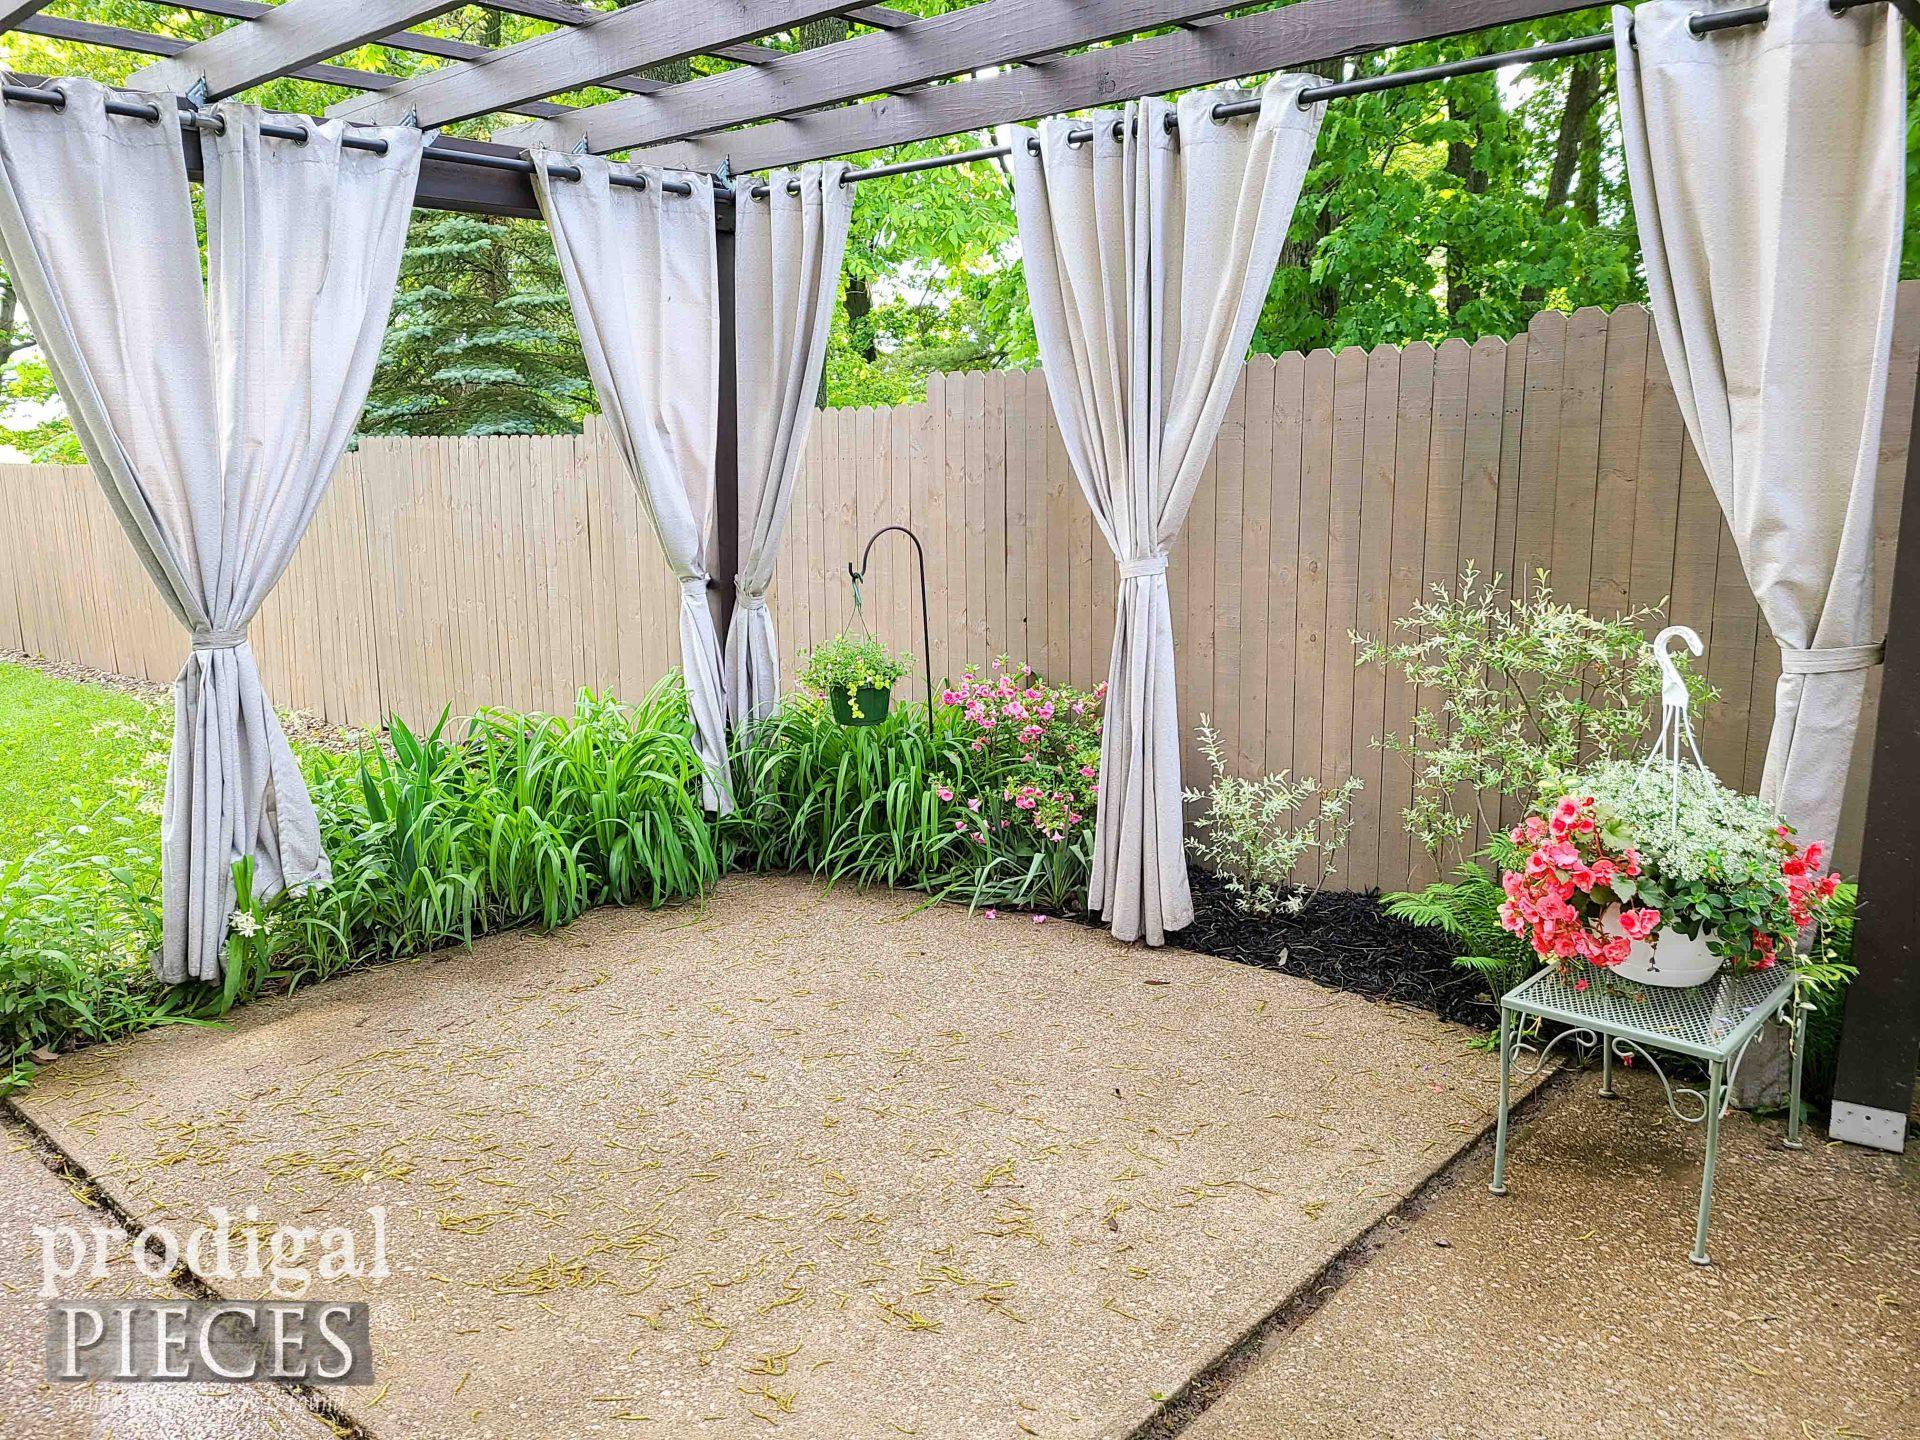 Clean Patio Before Furniture | prodigalpieces.com